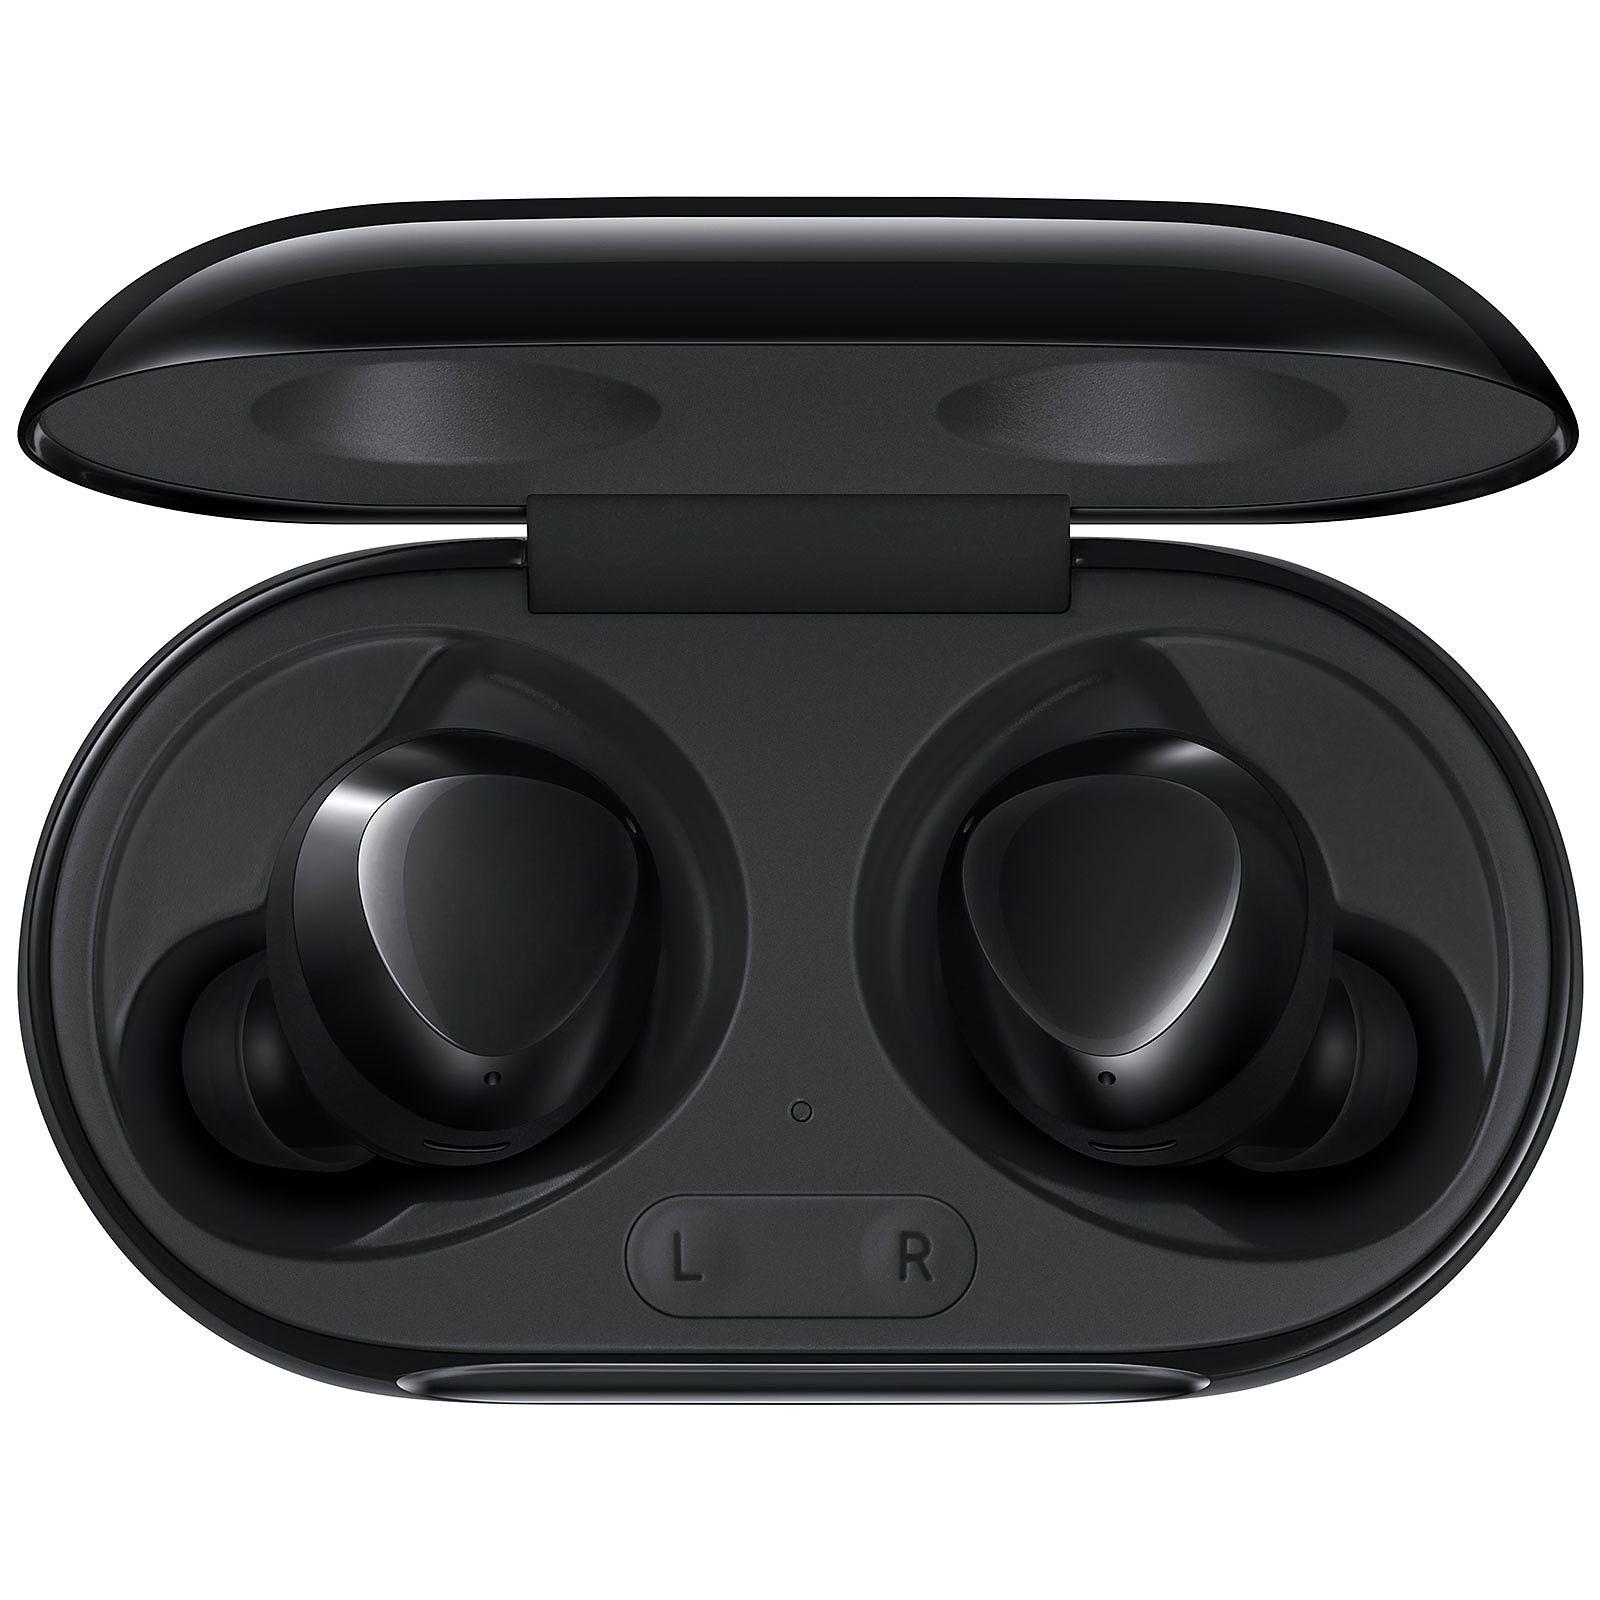 Samsung Galaxy Buds+: Kabellose Kopfhörer (11h Akku, AKG Treiber, 3 Mikrofone, SM-R175)